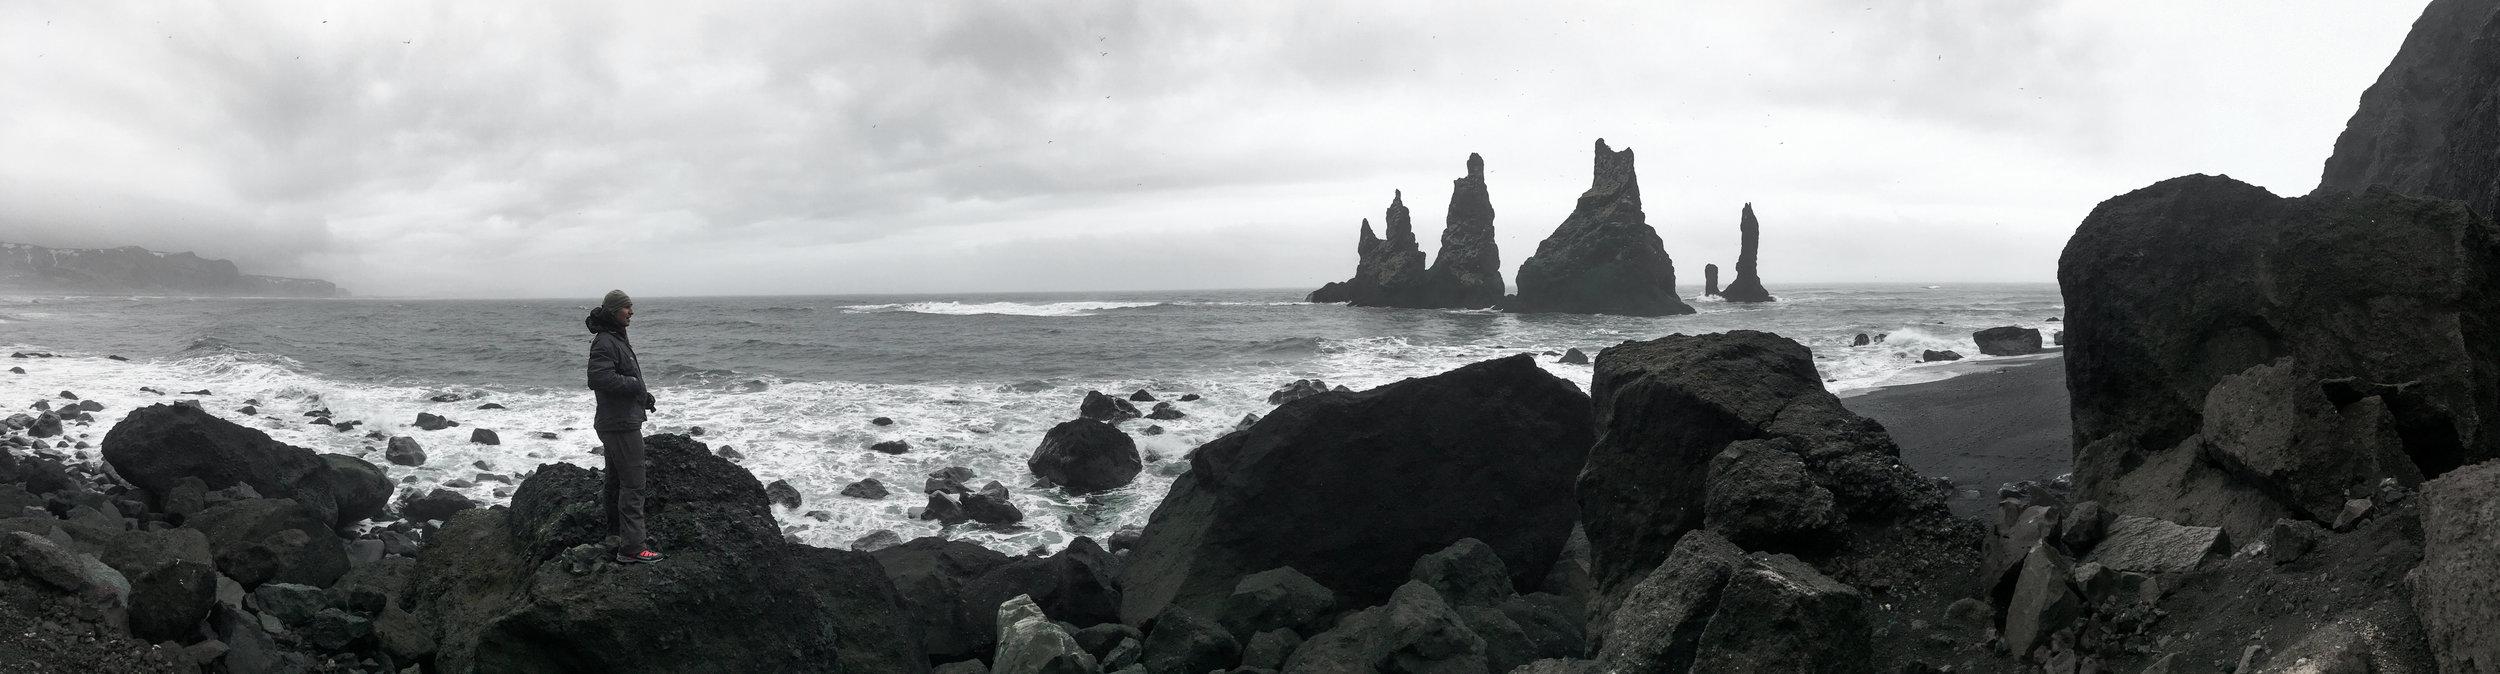 Iceland-4652.jpg